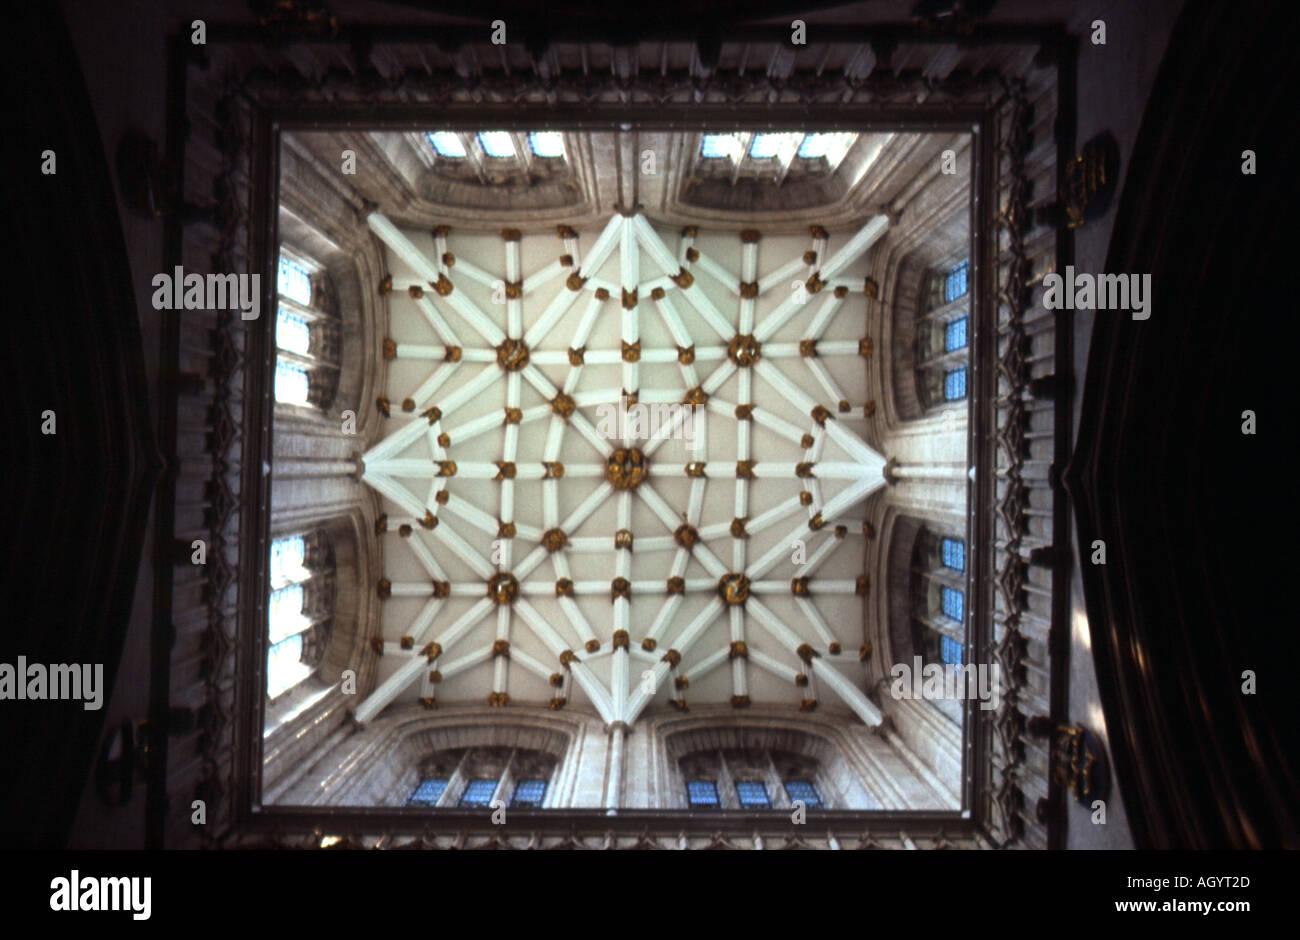 Ceiling of York Minster - Stock Image